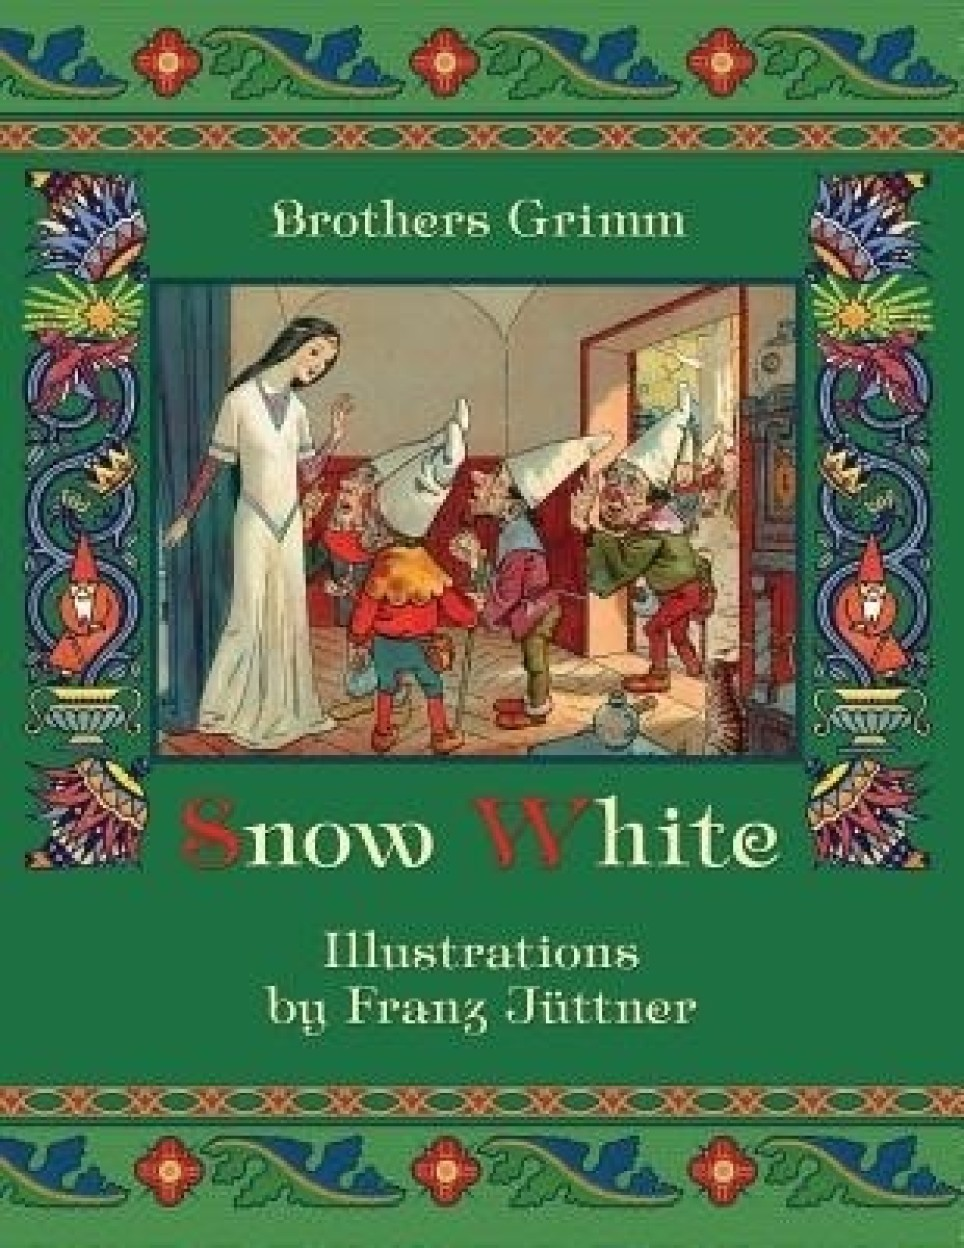 Snow White by Jacob Grimm,Wilhelm Grimm,Franz Juttner